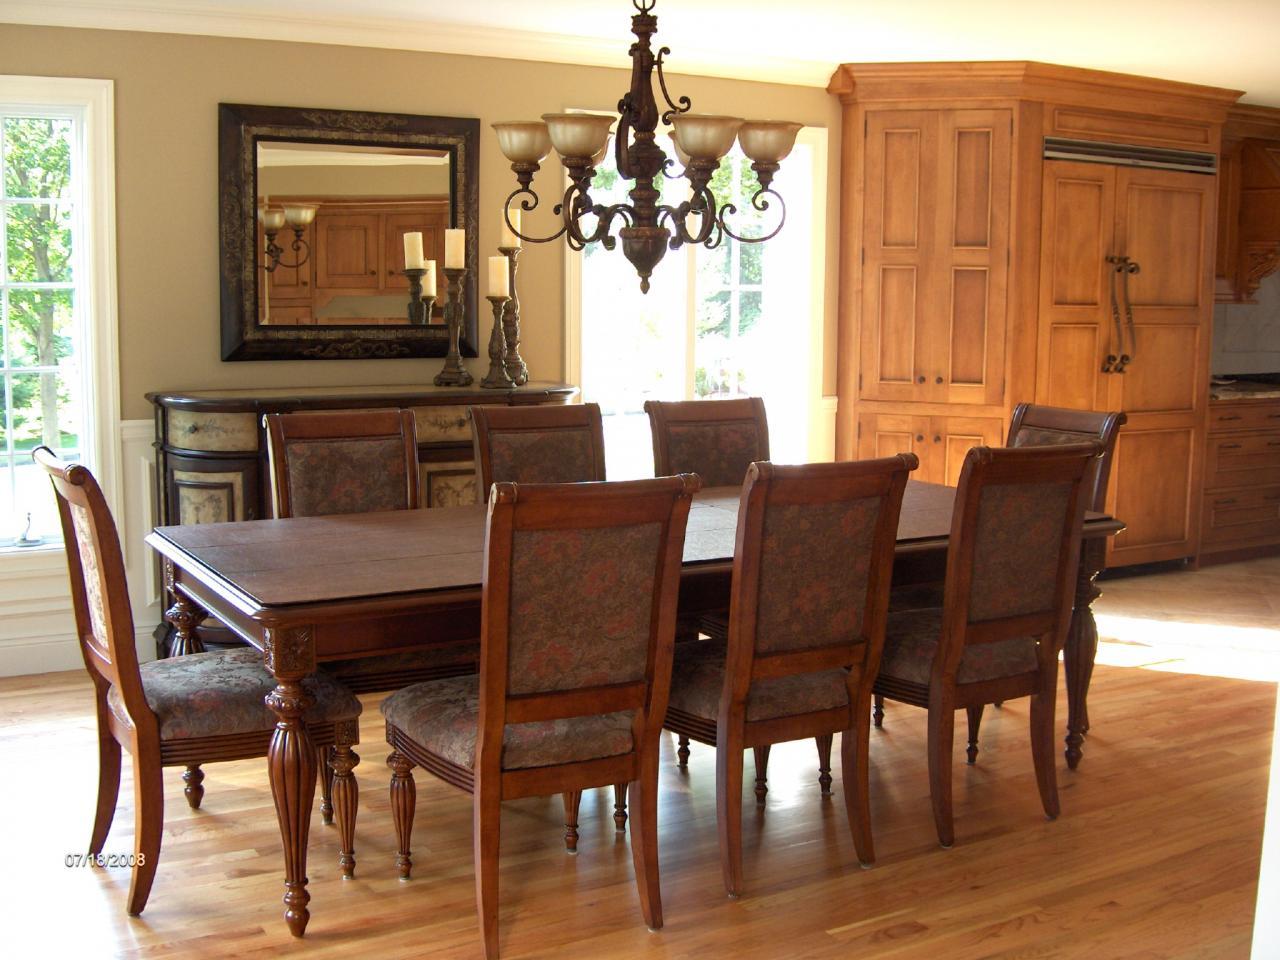 dining room furniture design photo - 2